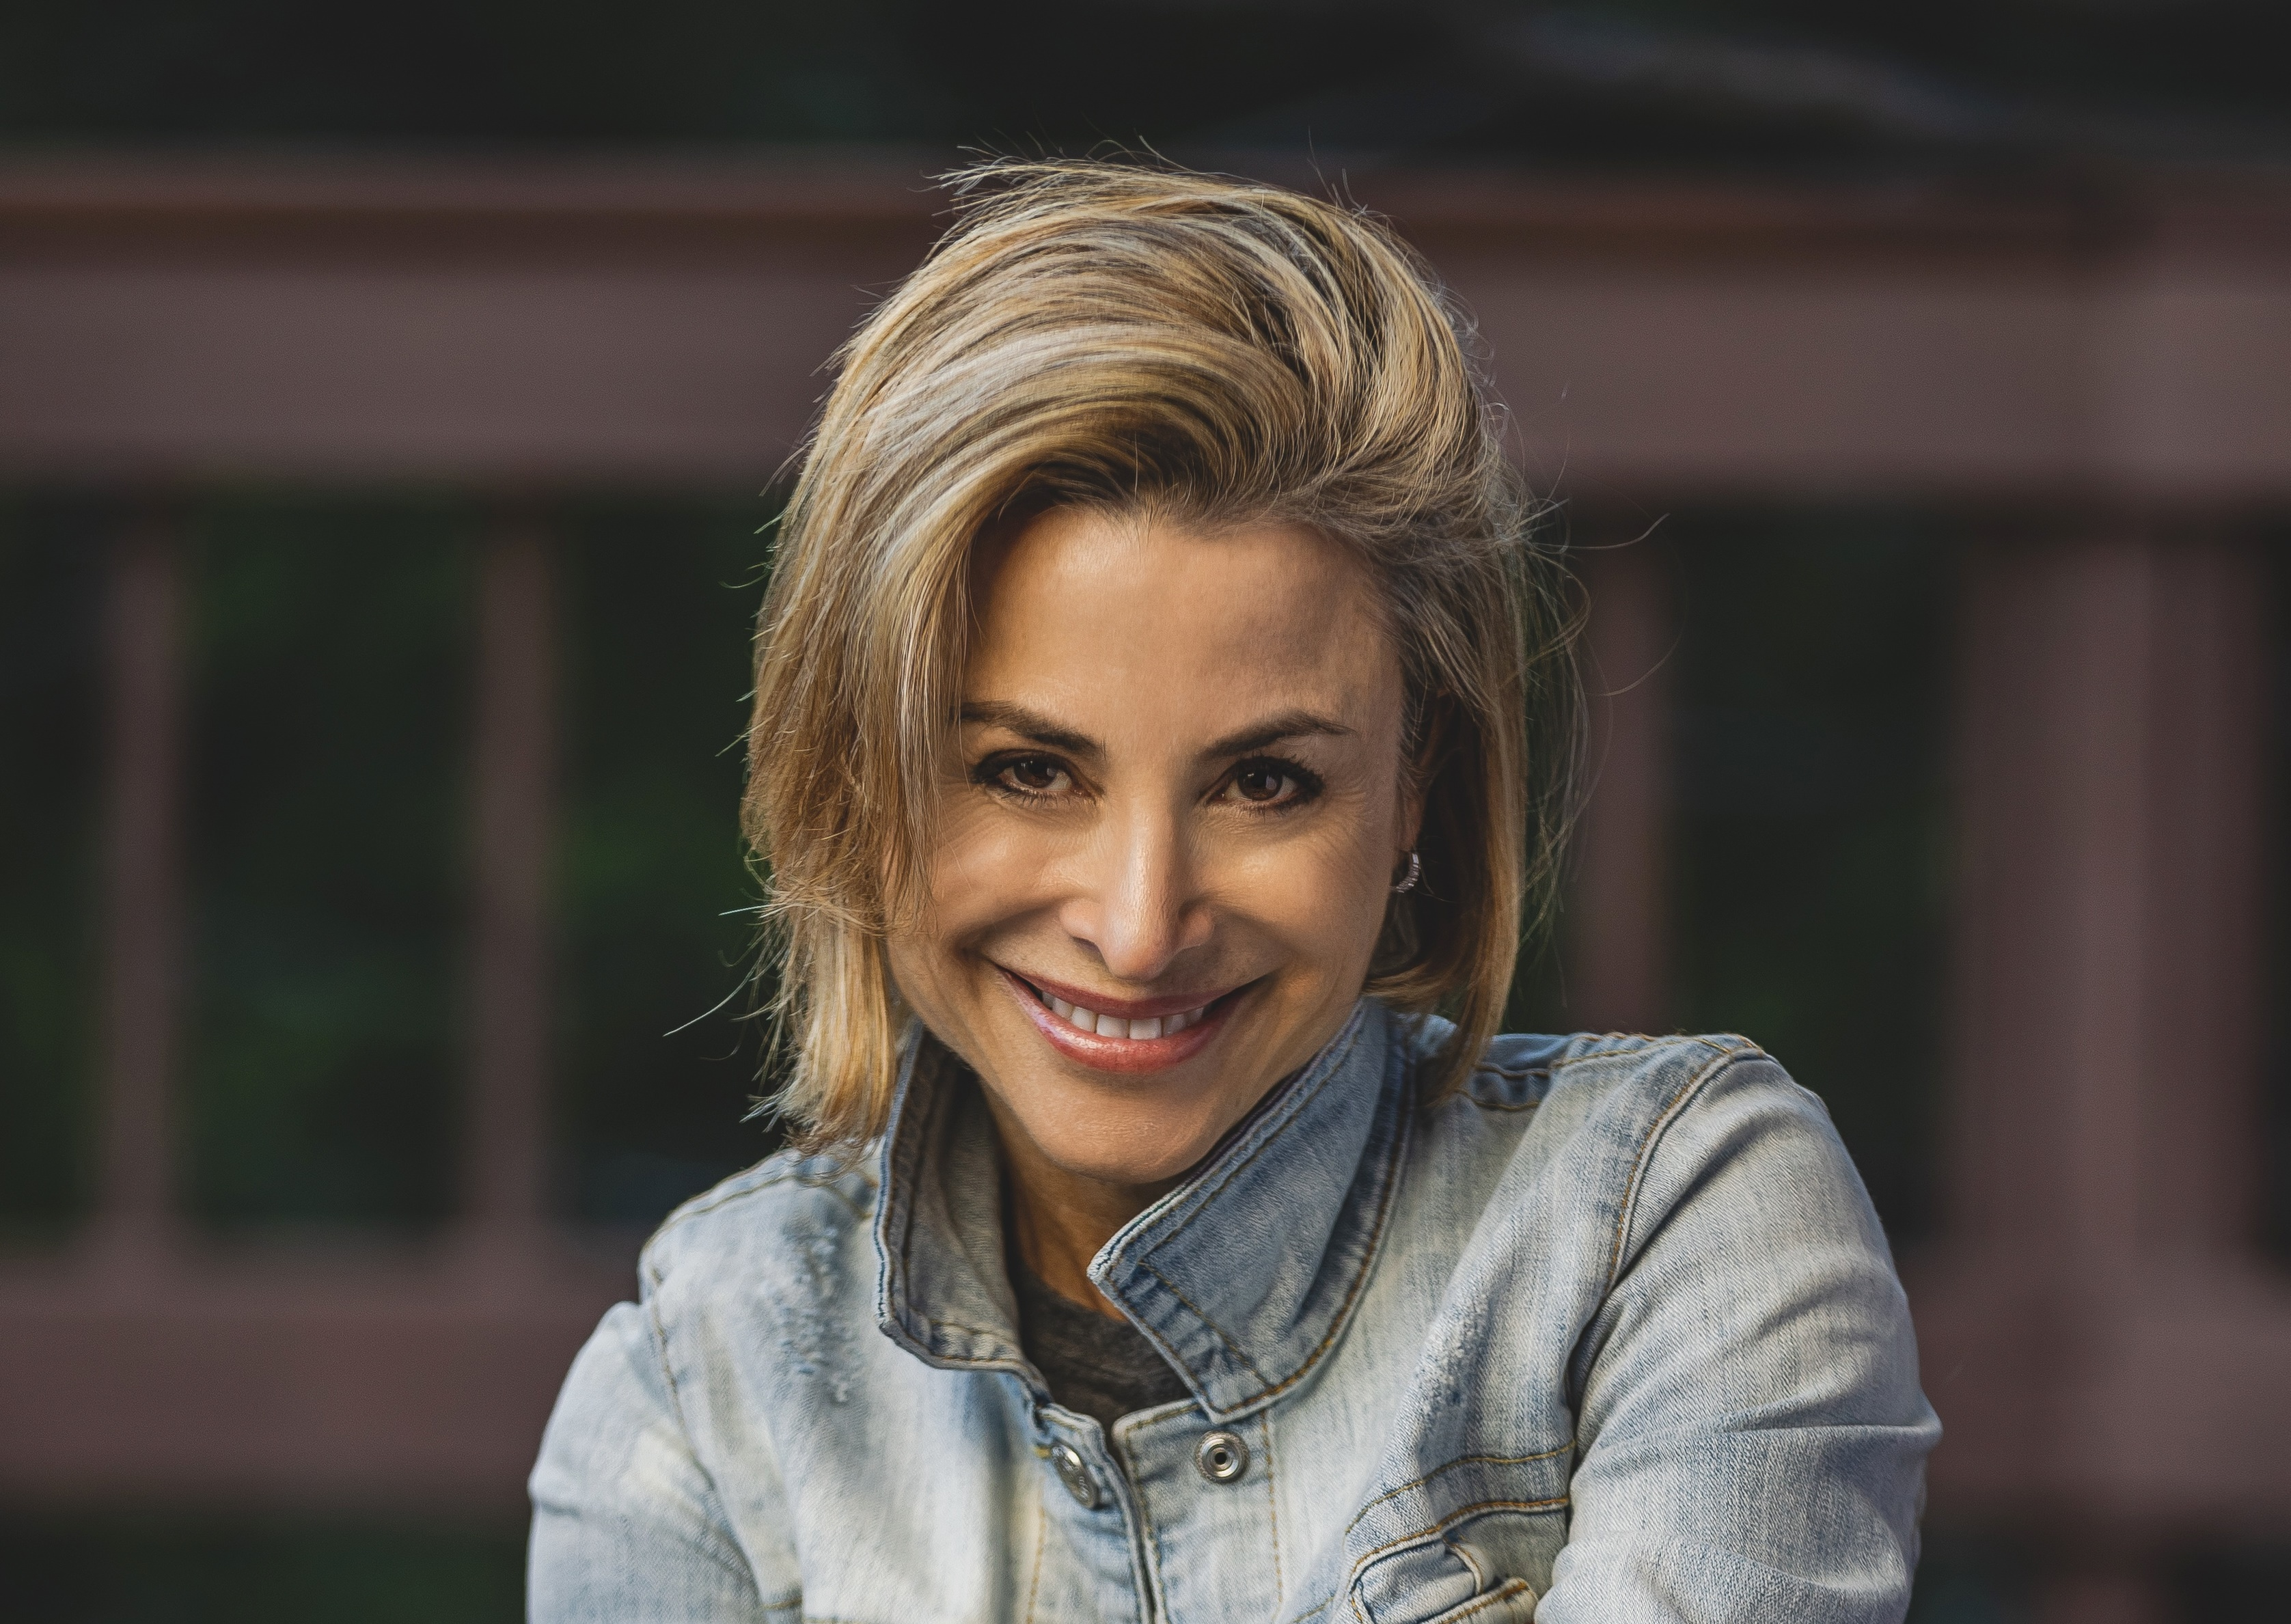 Silvina Moschini